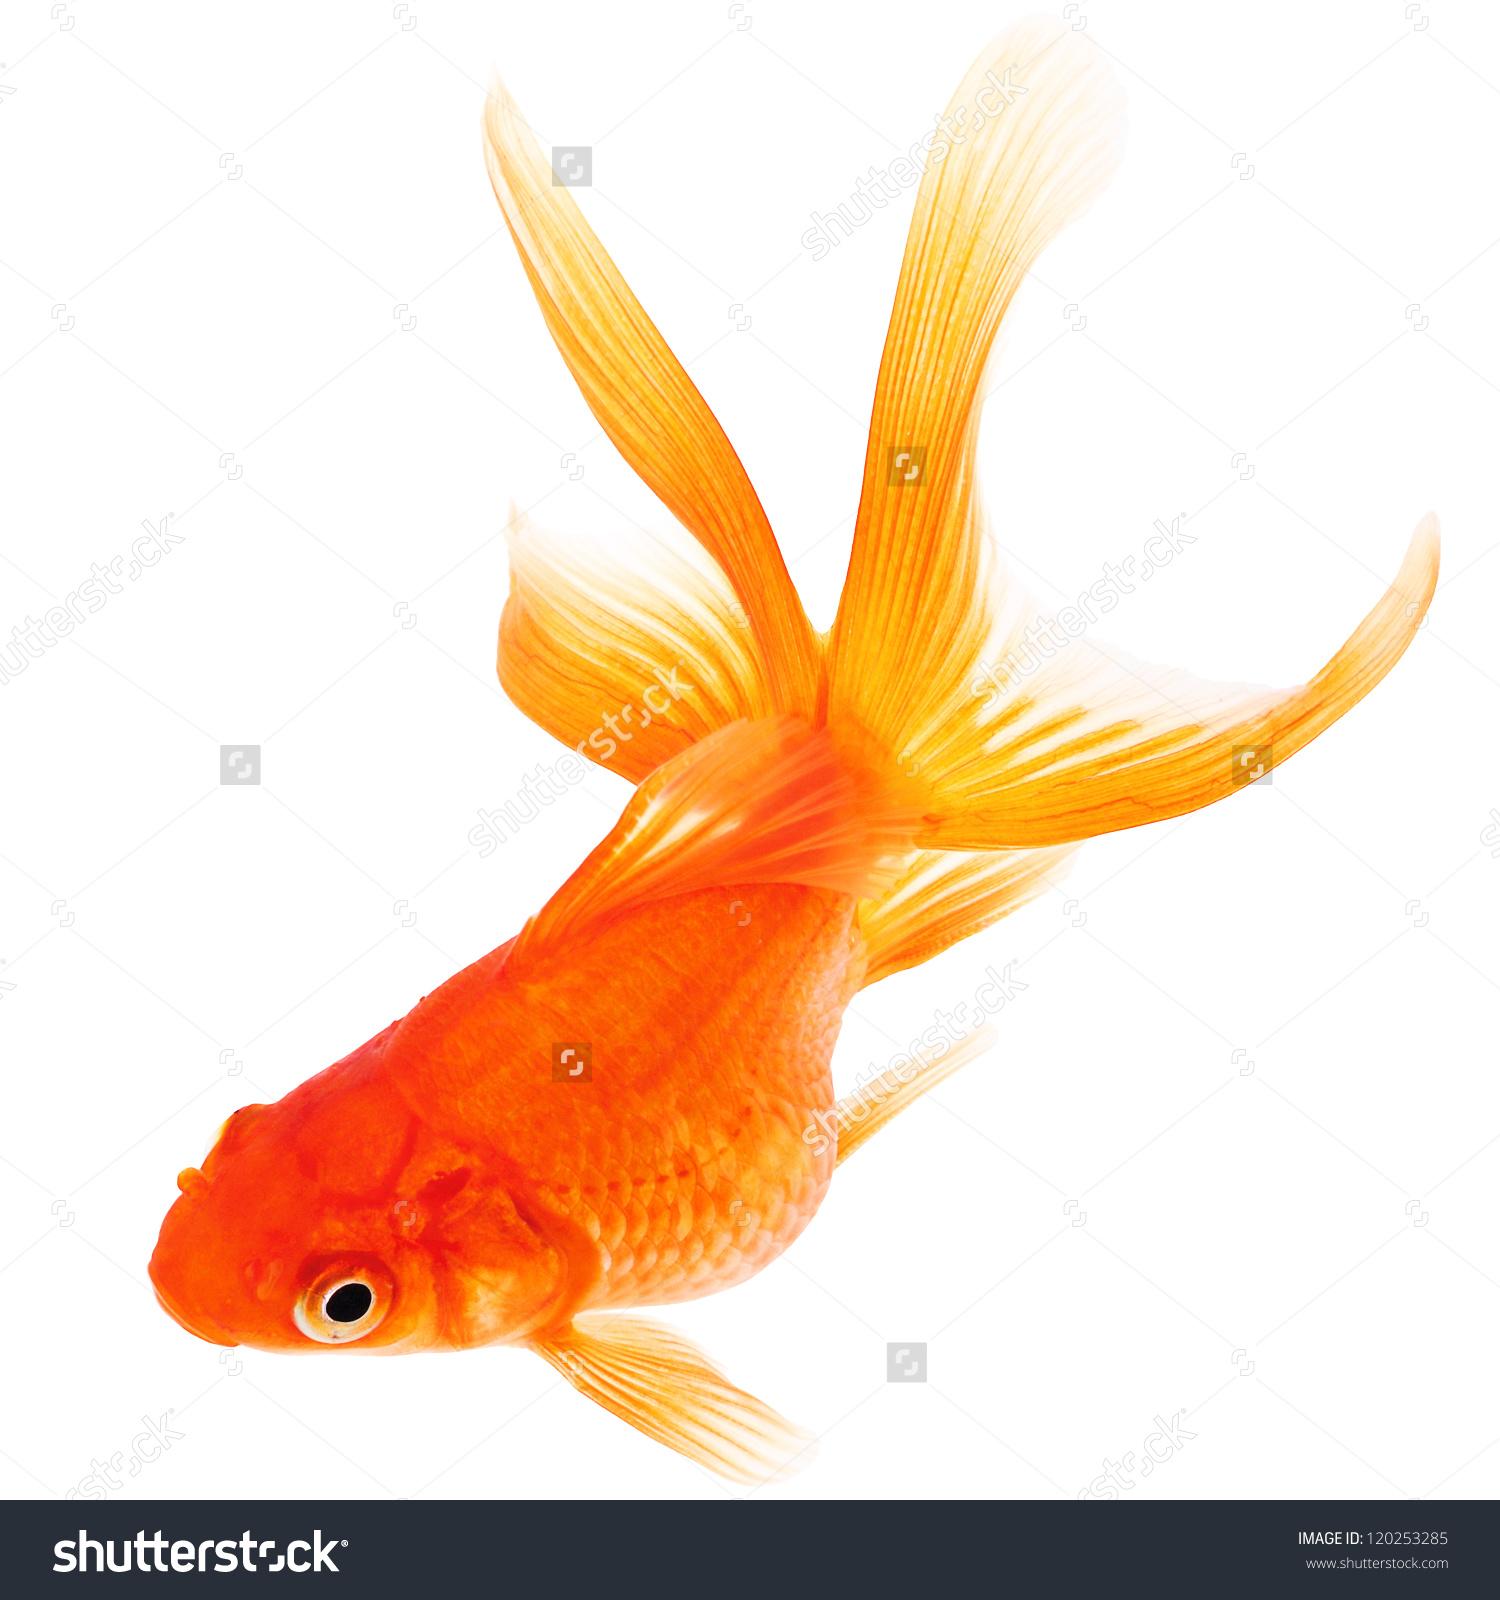 HD Quality Wallpaper   Collection: Animal, 1500x1600 Goldfish